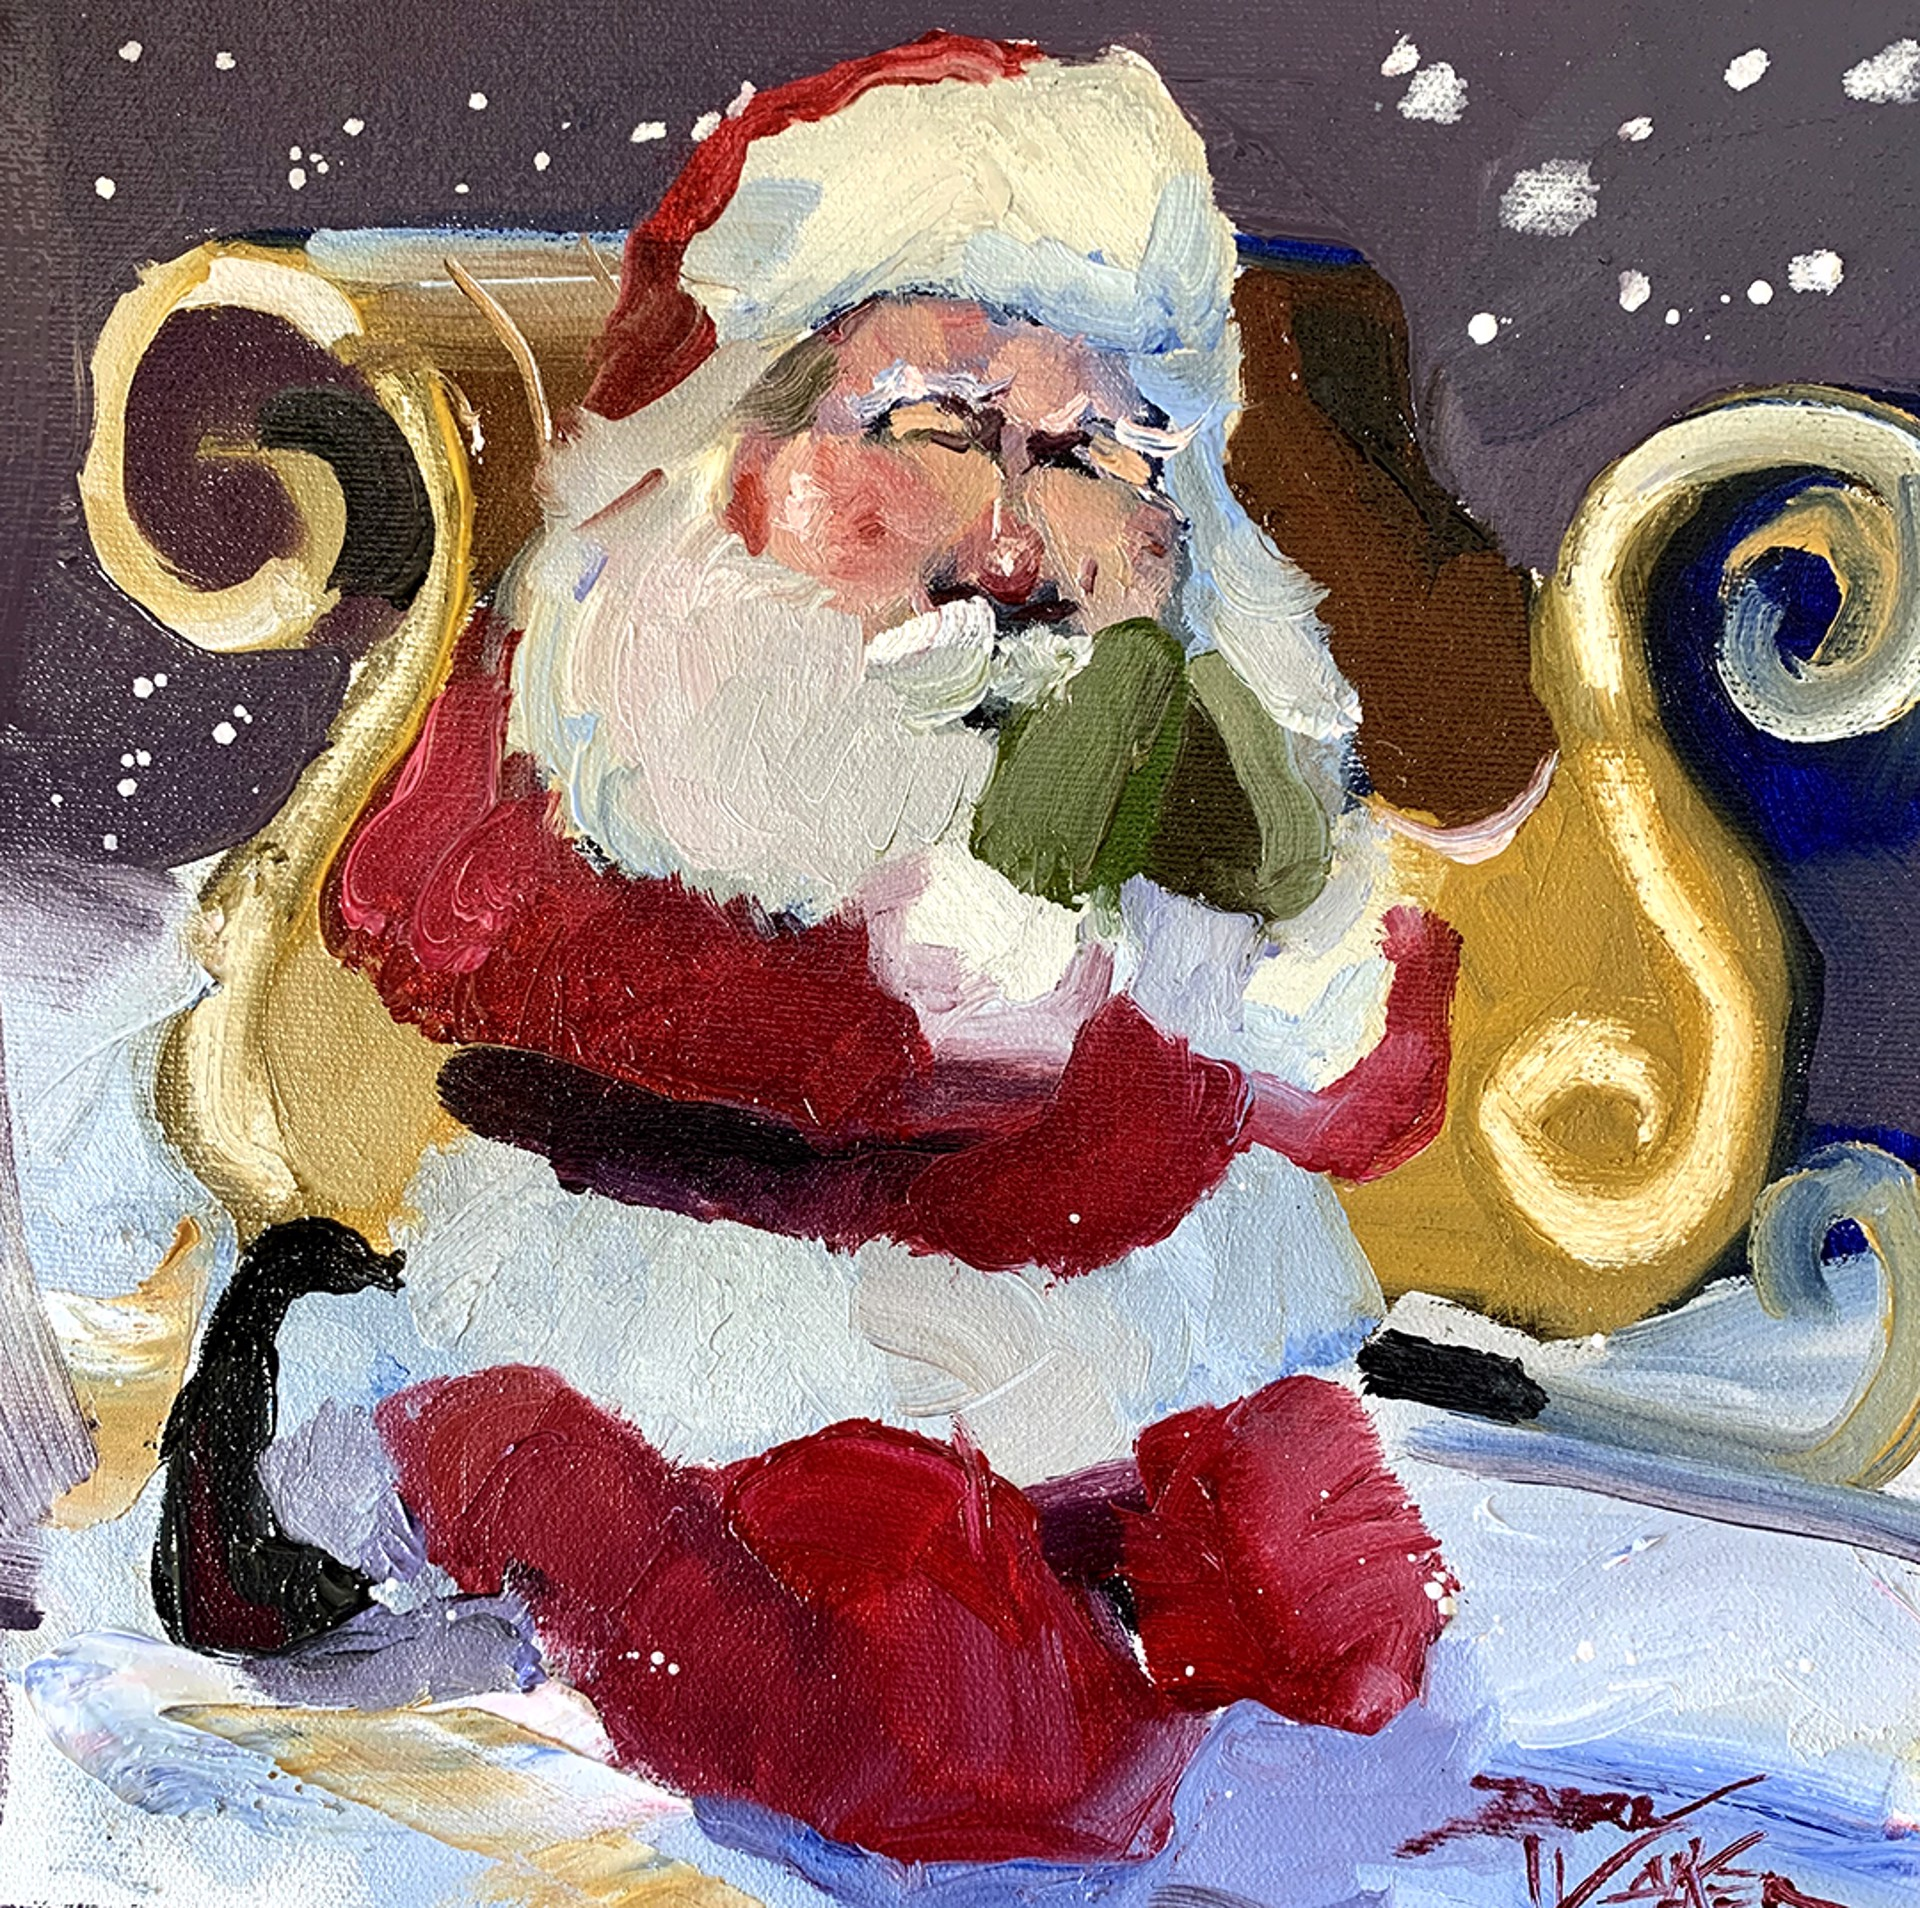 Santa's Prayers by Dirk Walker